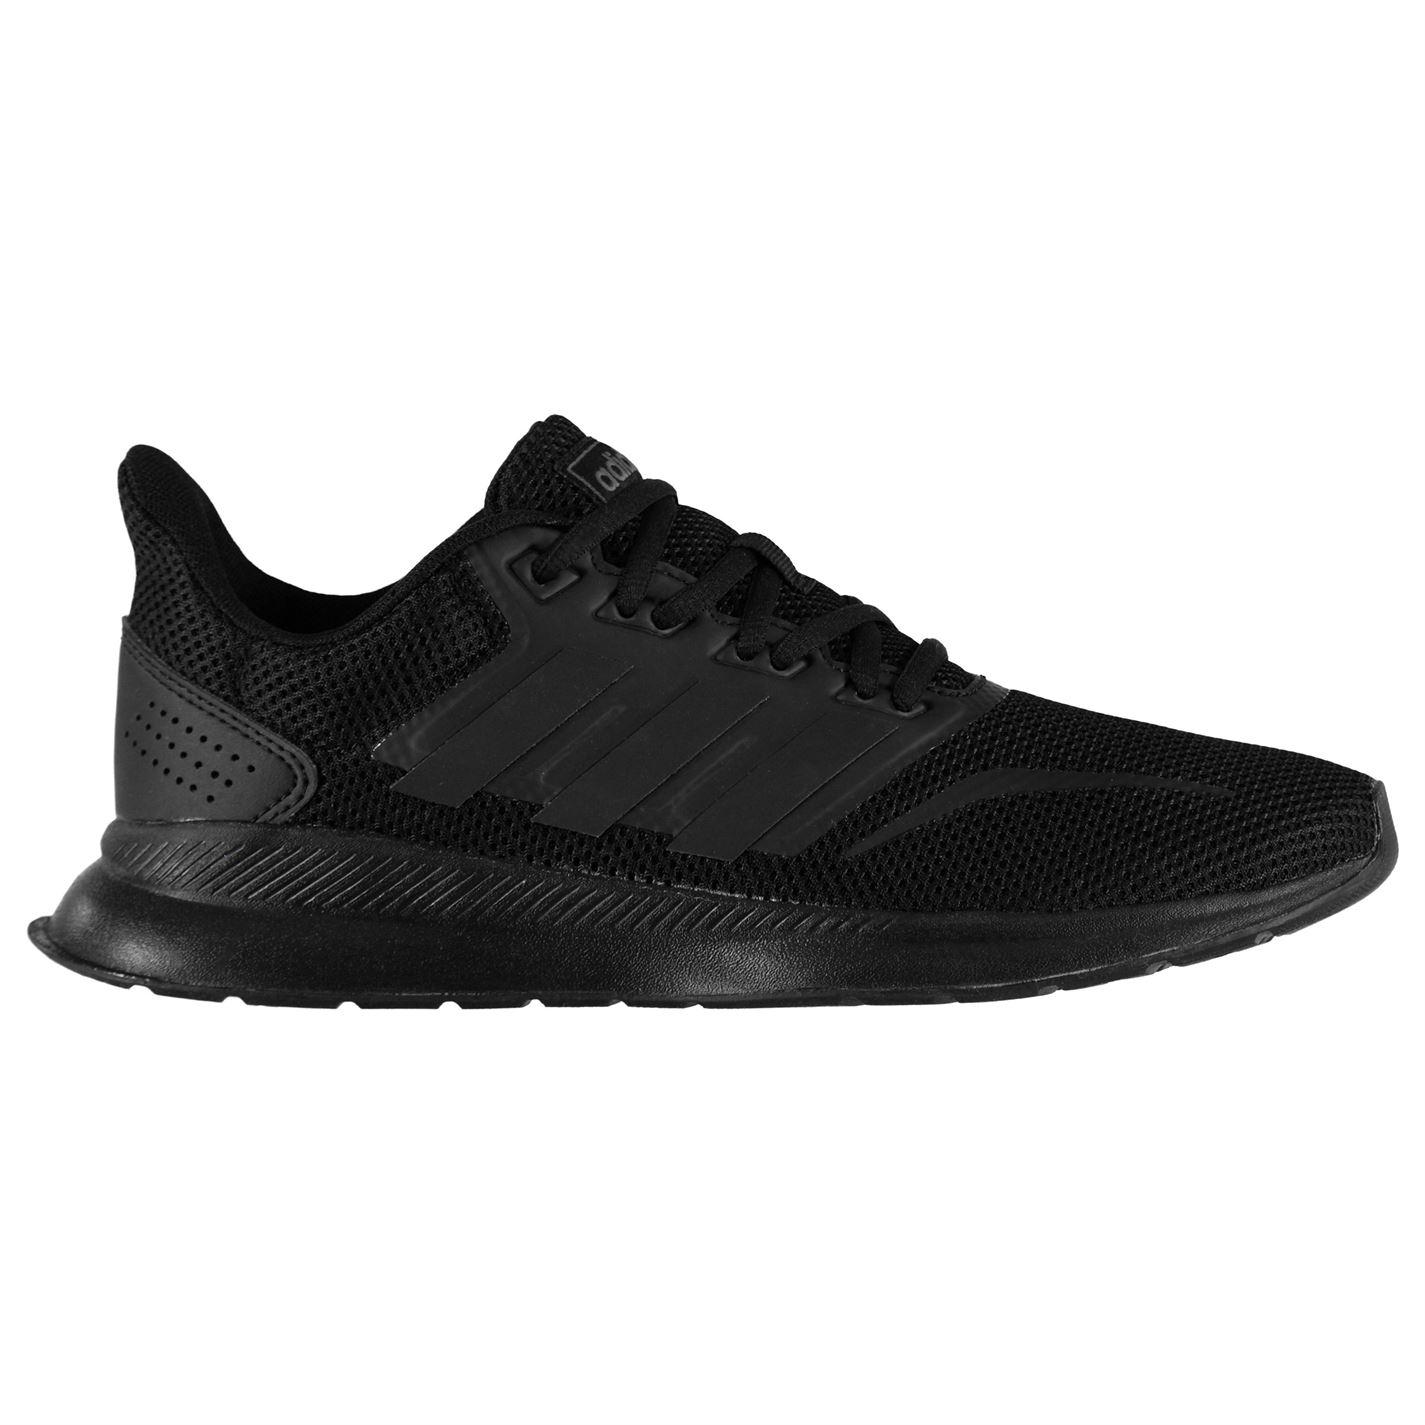 adidas Falcon Ladies Trainers TripleBlack - Glami.sk aafe0651a10